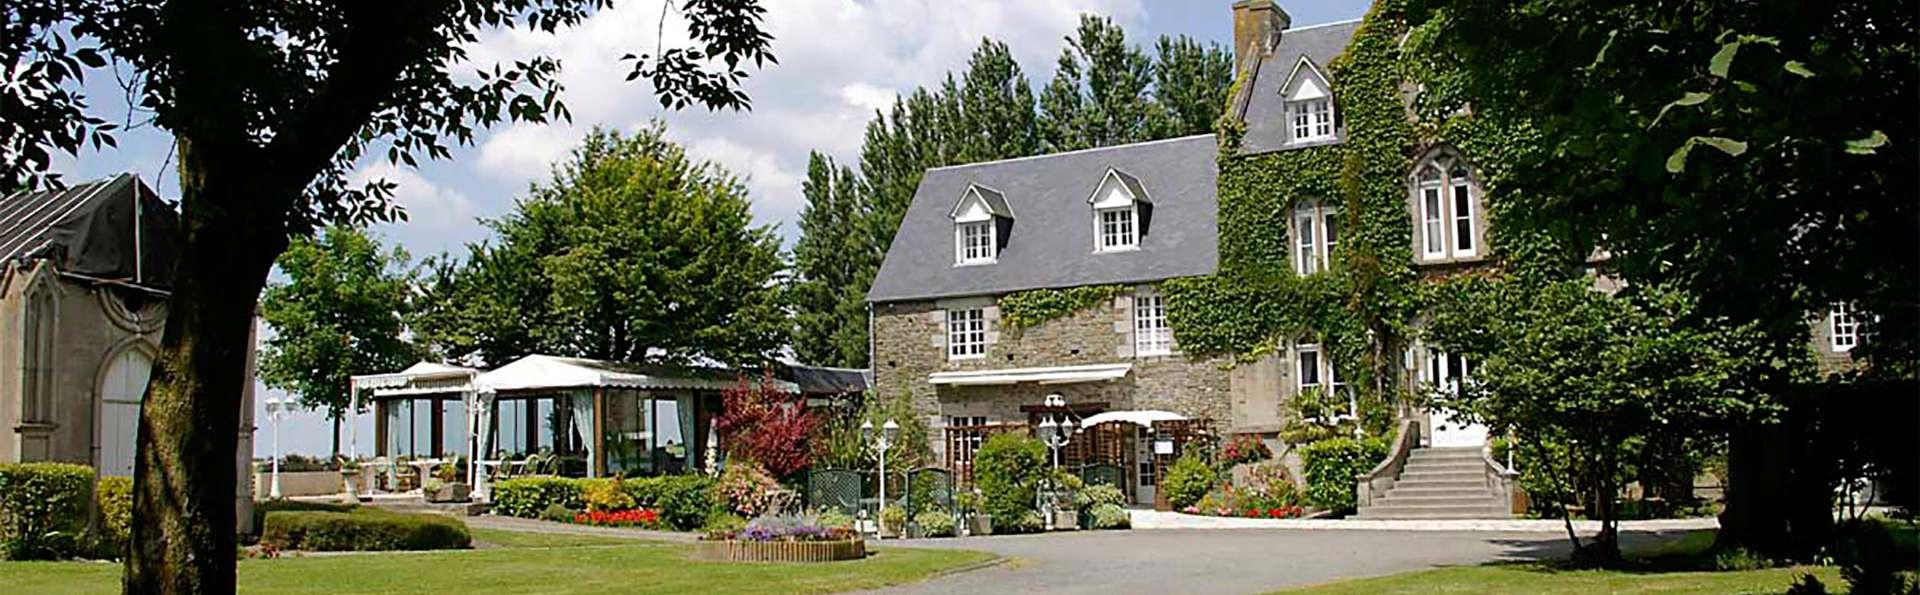 Hotel The Originals Manoir de la Roche Torin (ex Relais du Silence) - EDIT_front.jpg